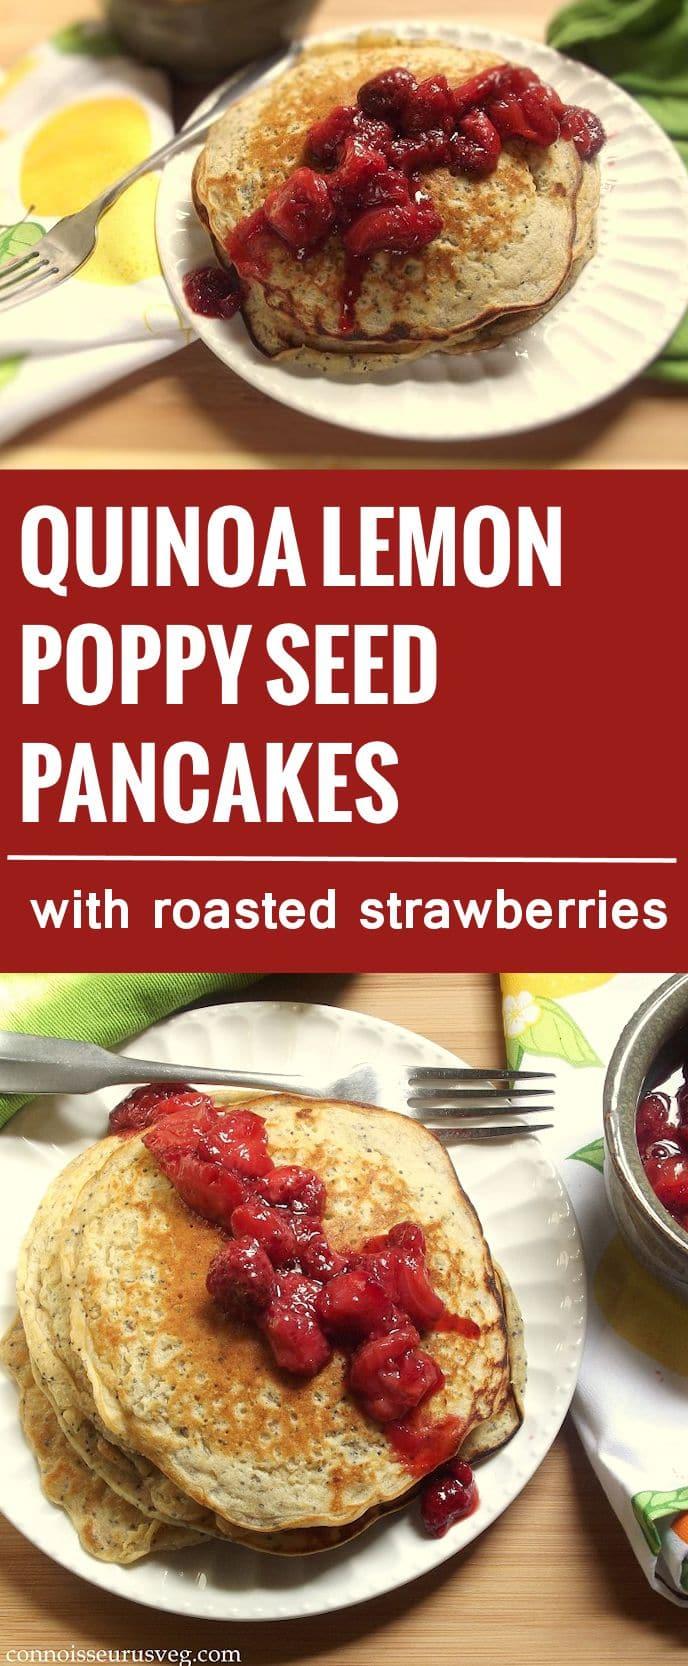 Quinoa Lemon Poppy Seed Pancakes with Roasted Strawberries